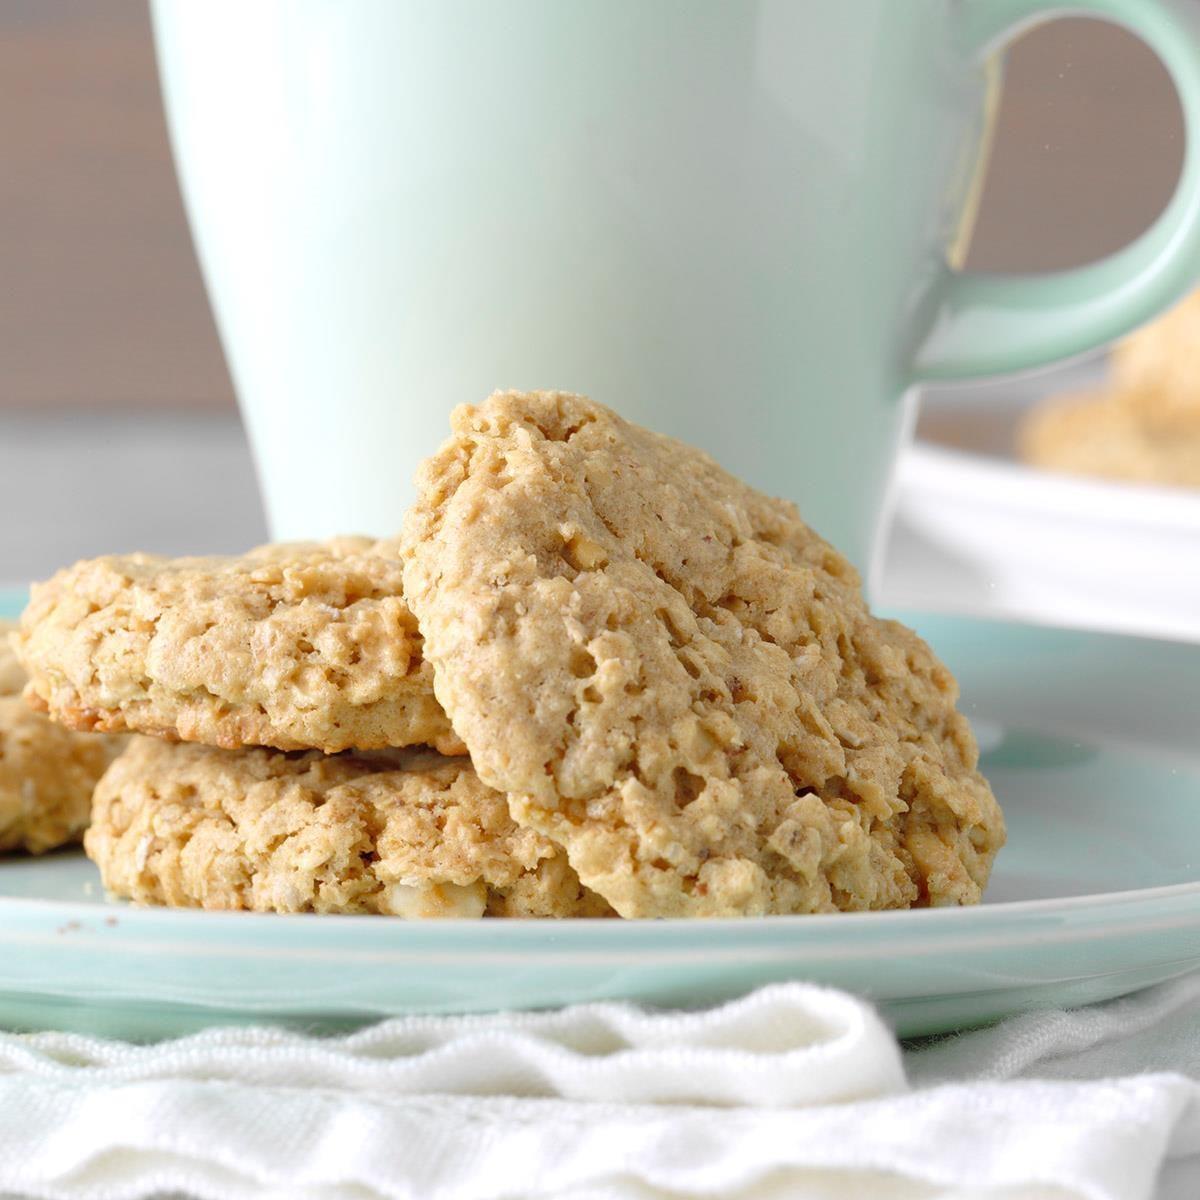 Easy Peanut Butter Oatmeal Cookies Exps Diyd19 44945 B05 01 2b 7